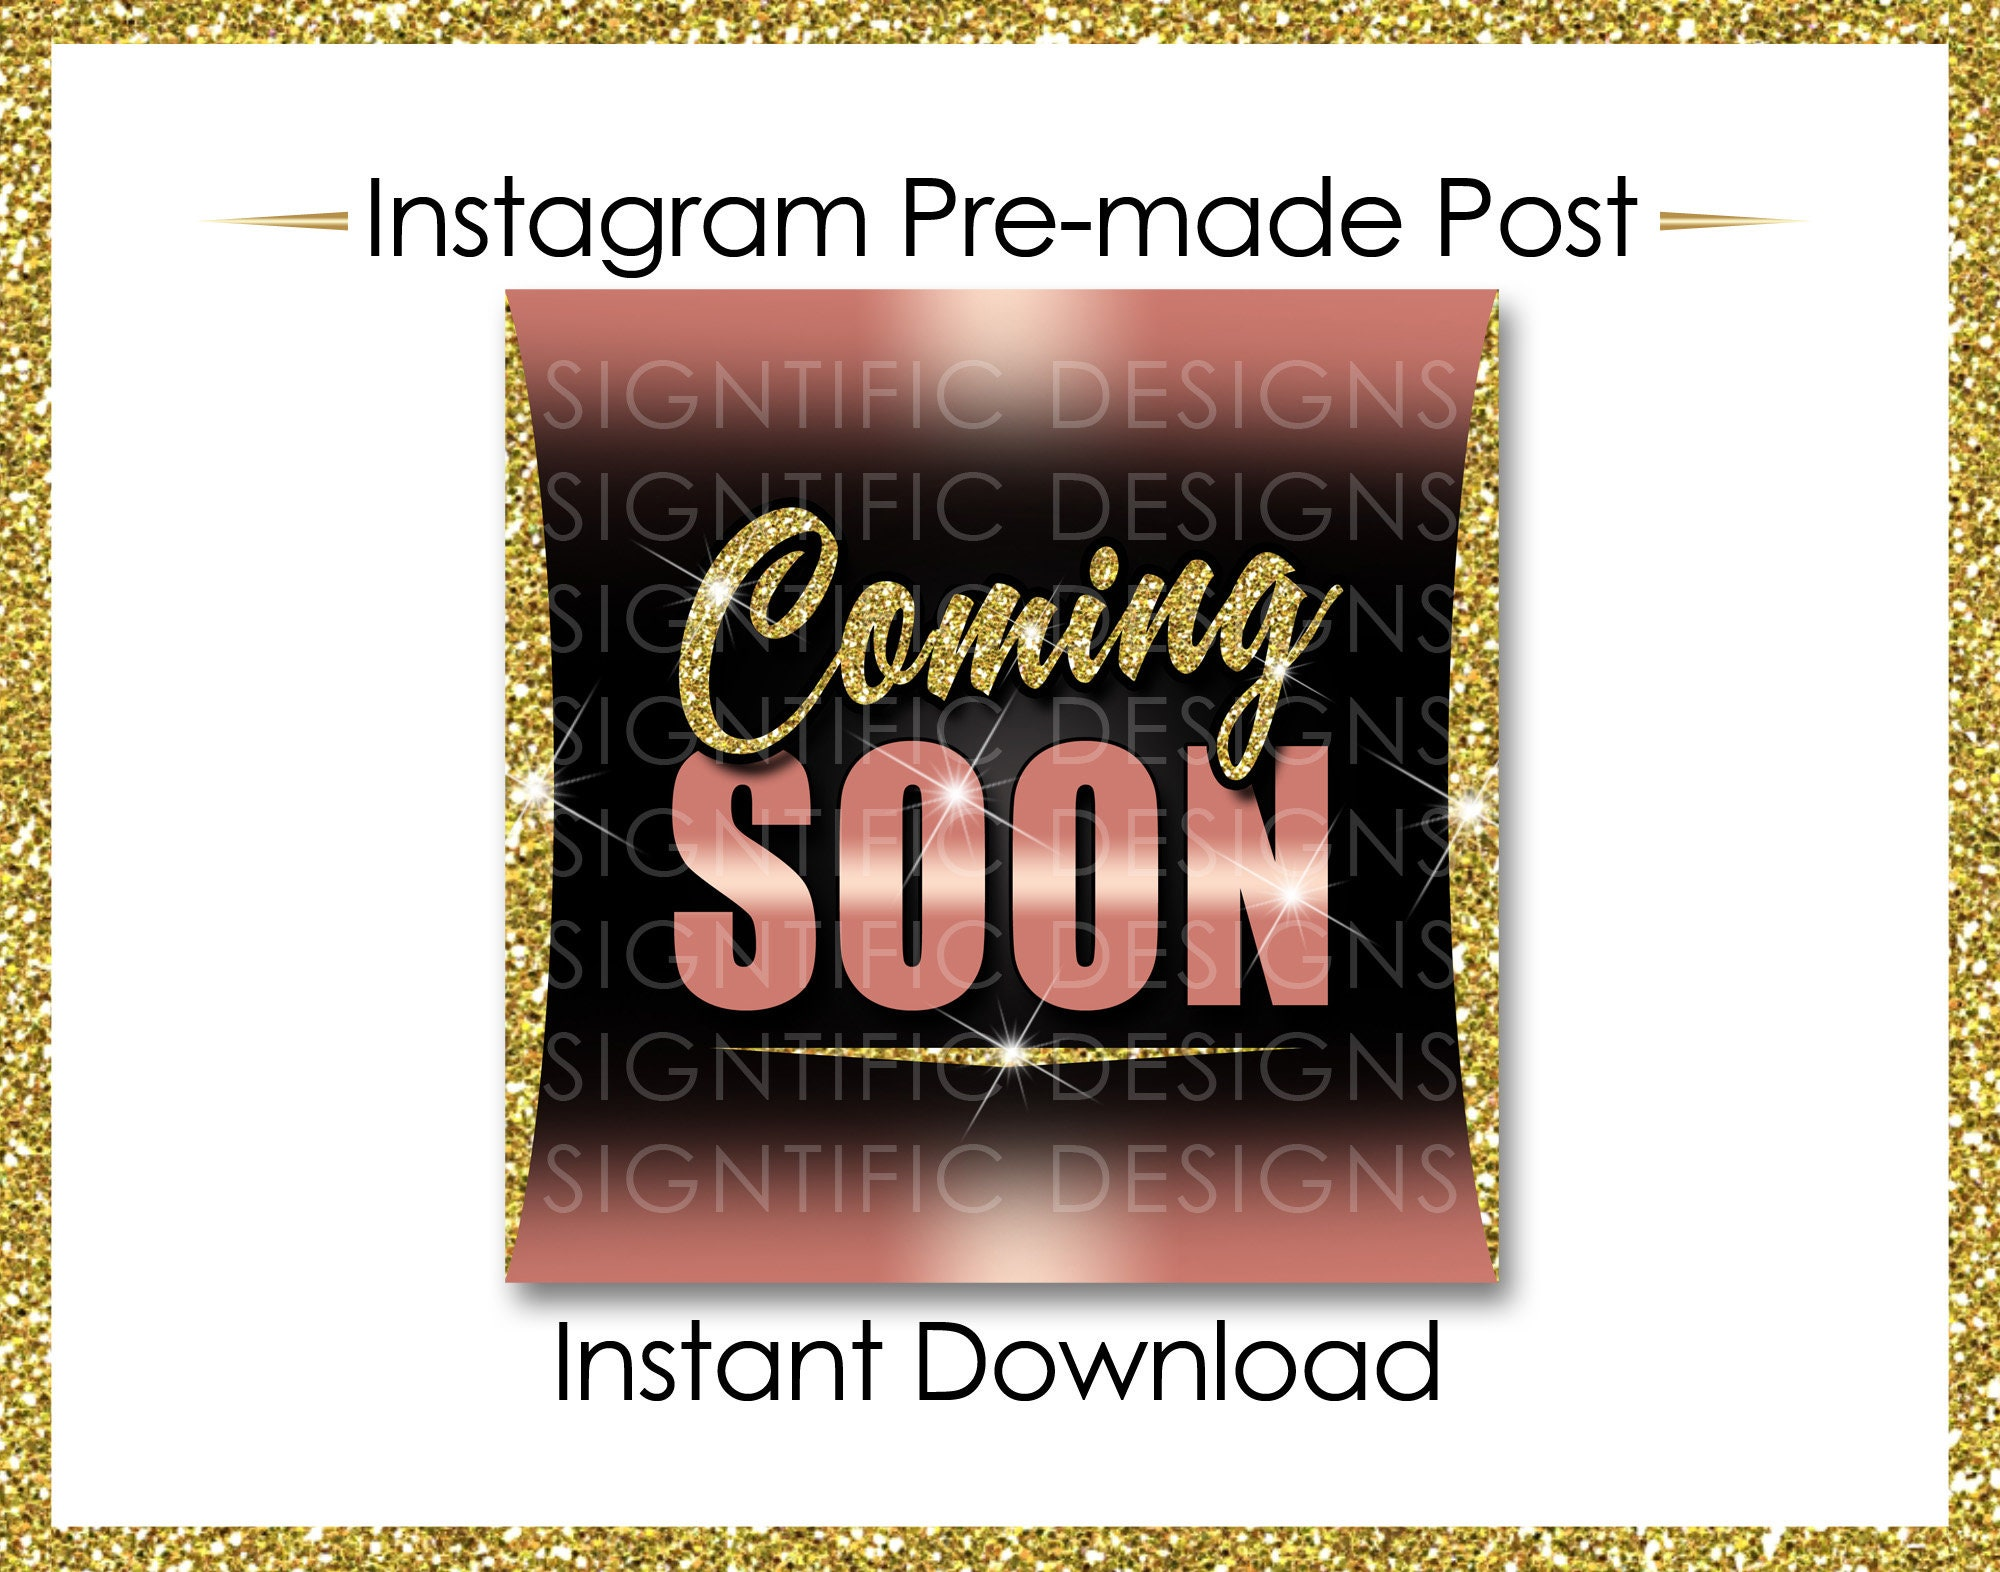 Instant Download Coming Soon Hair Extensions Flyer Glitter Gold Rose Gold Instagram Post Digital Online Flyer Social Media Post Ig Ad